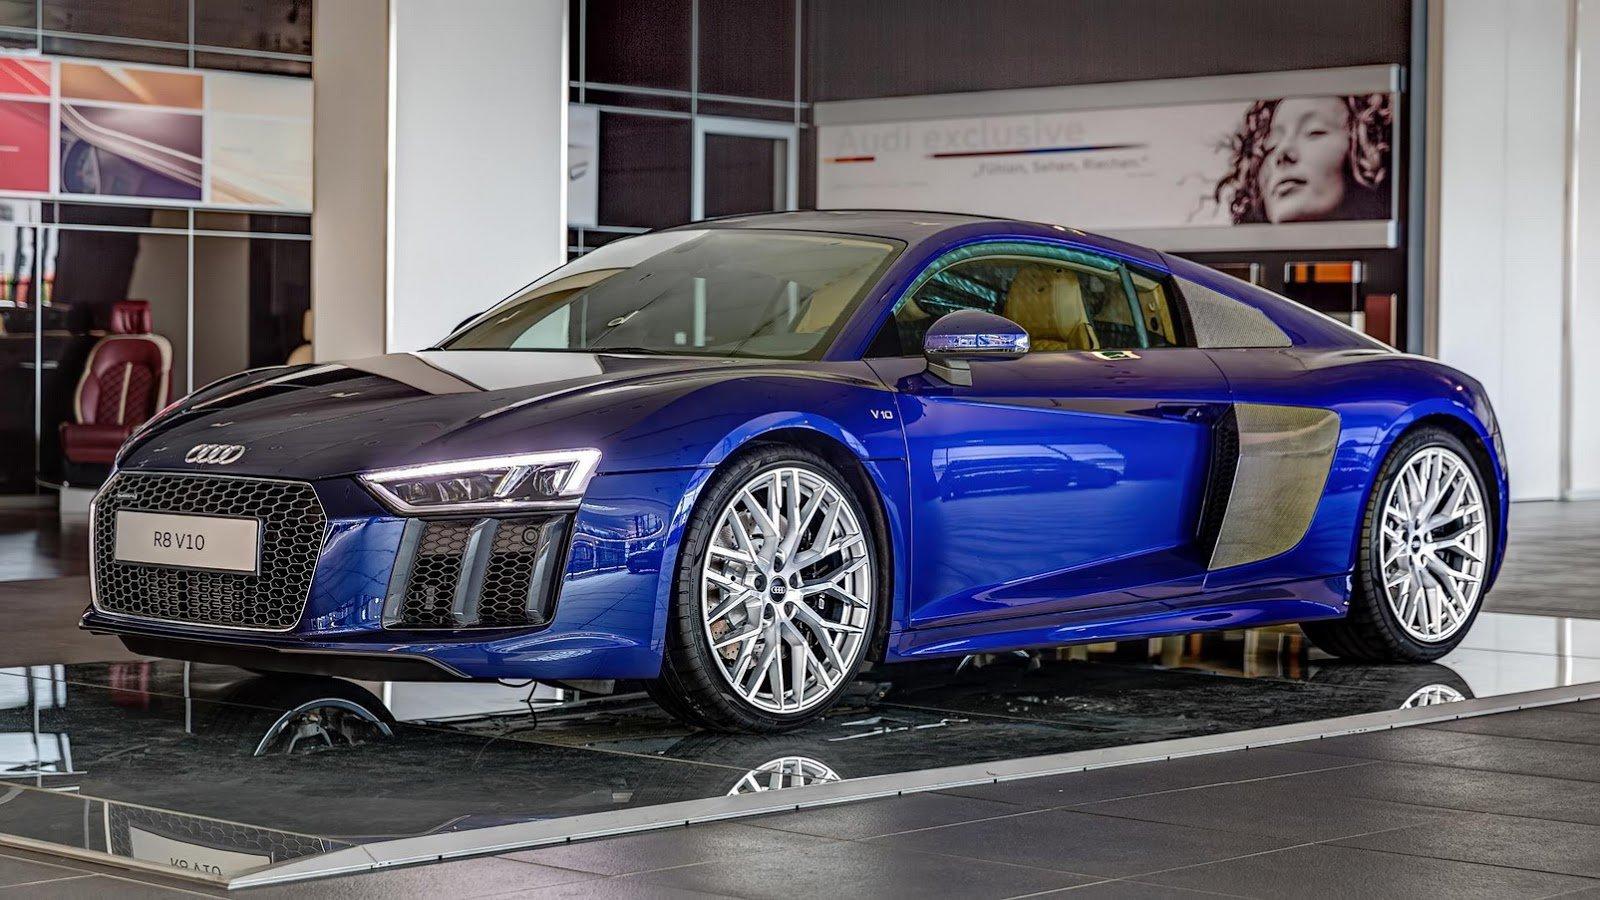 Audi R8 2016 540PS - Leasing Privat oder Gewerbe - 24 Monate - 30tkm p.a